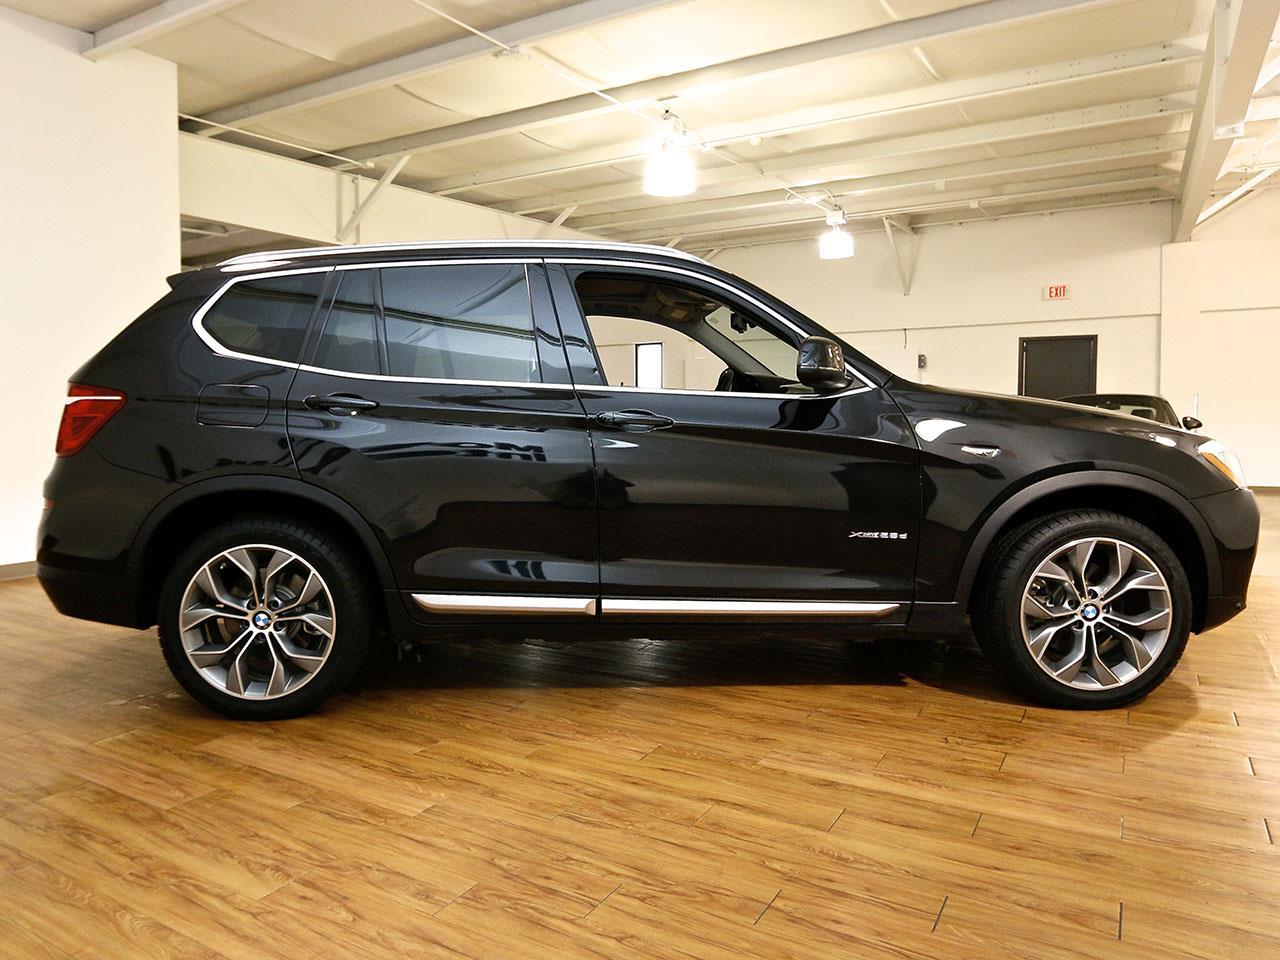 2016 bmw x3 xdrive 28d diesel. Black Bedroom Furniture Sets. Home Design Ideas